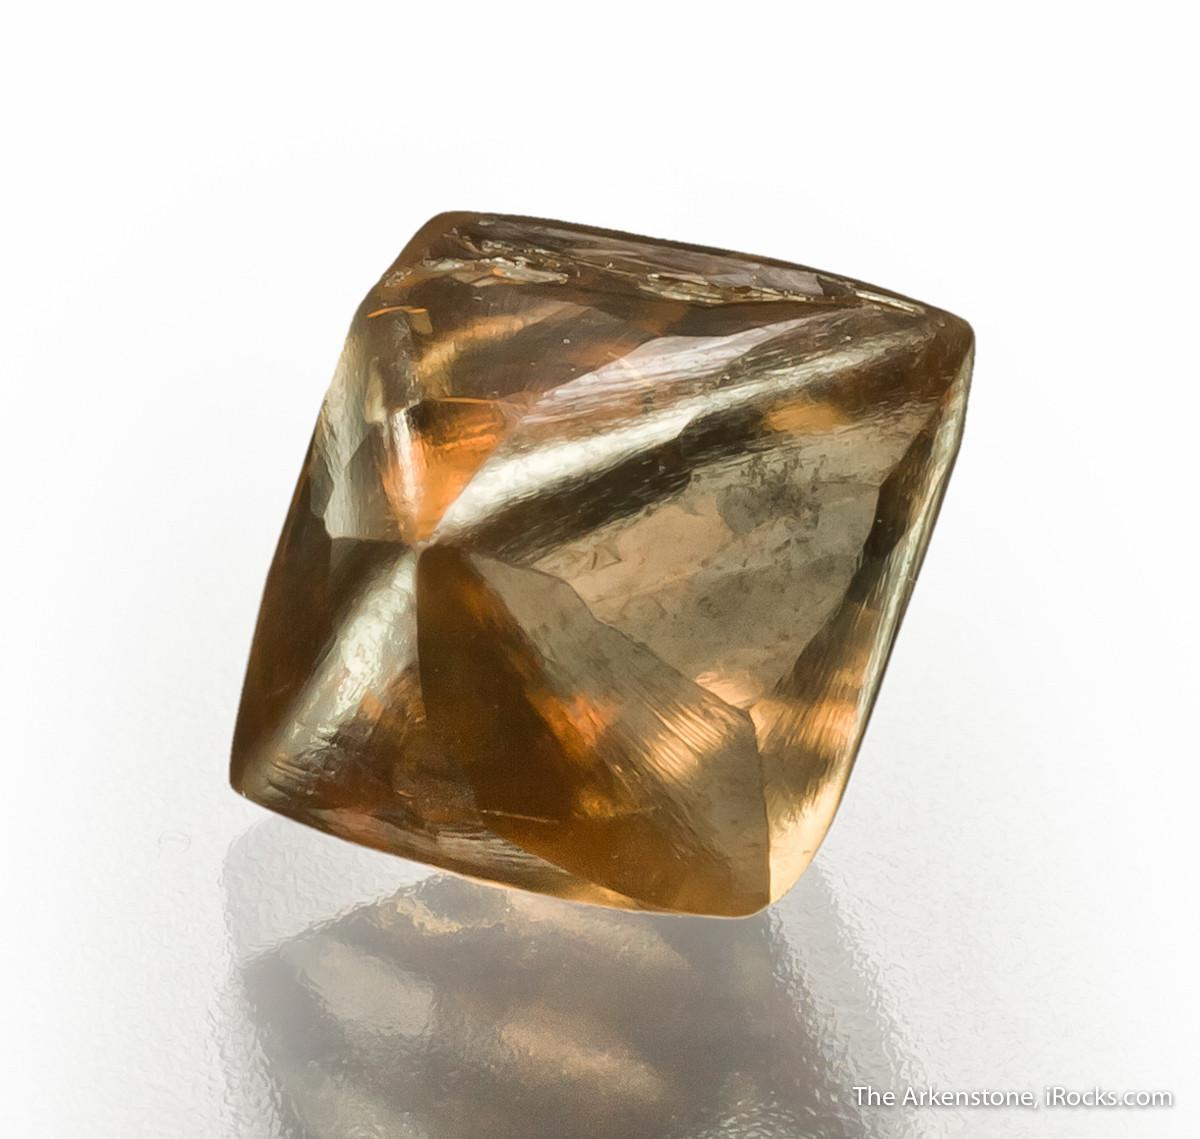 diamond-argyle-australia-404cts-jb1413-73-2